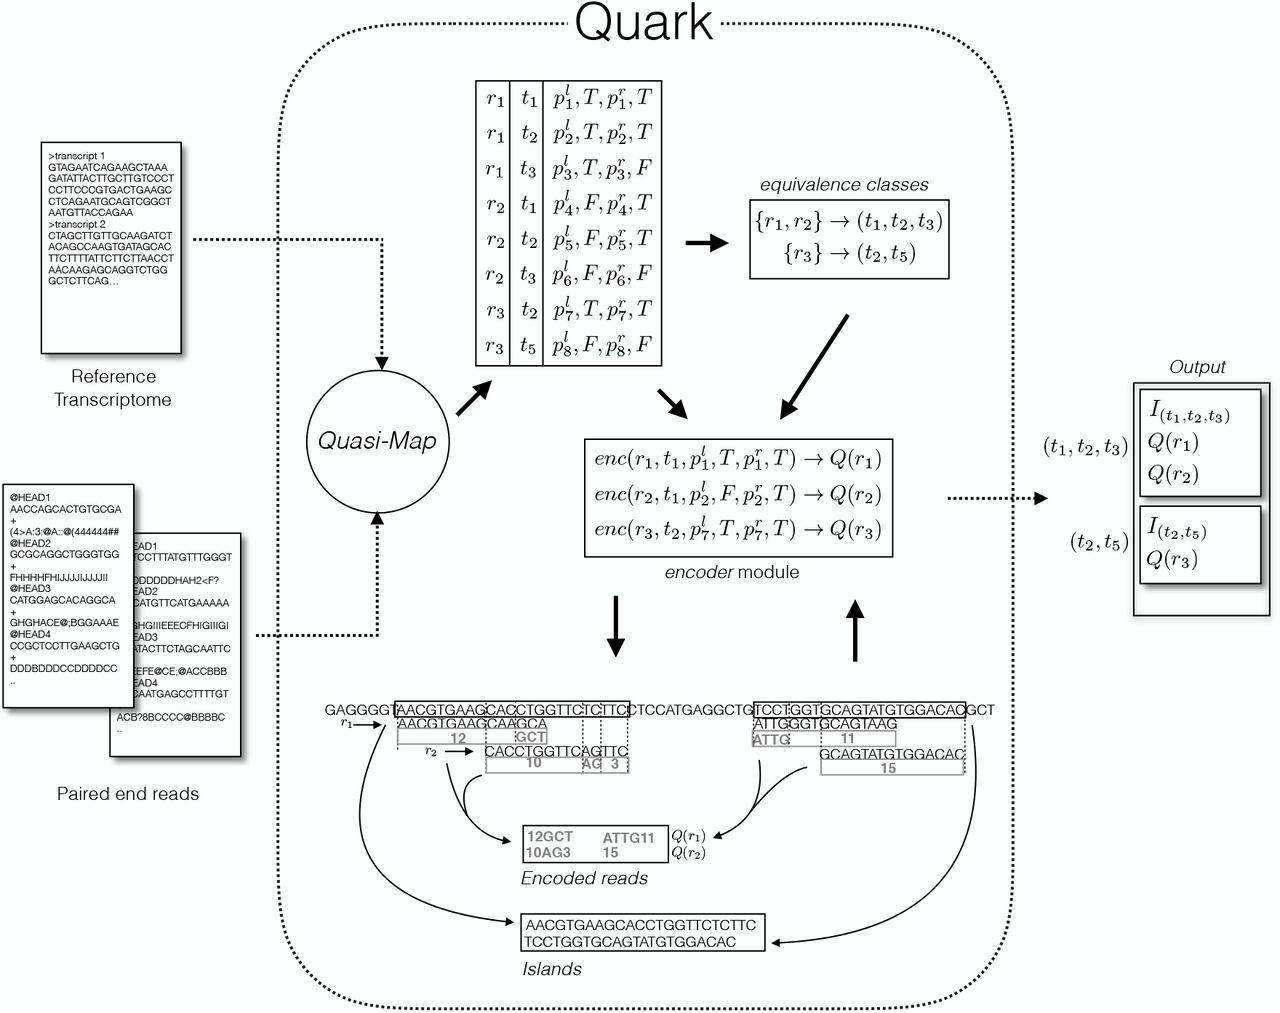 Quark enables semi-reference-based compression of RNA-seq data | bioRxiv